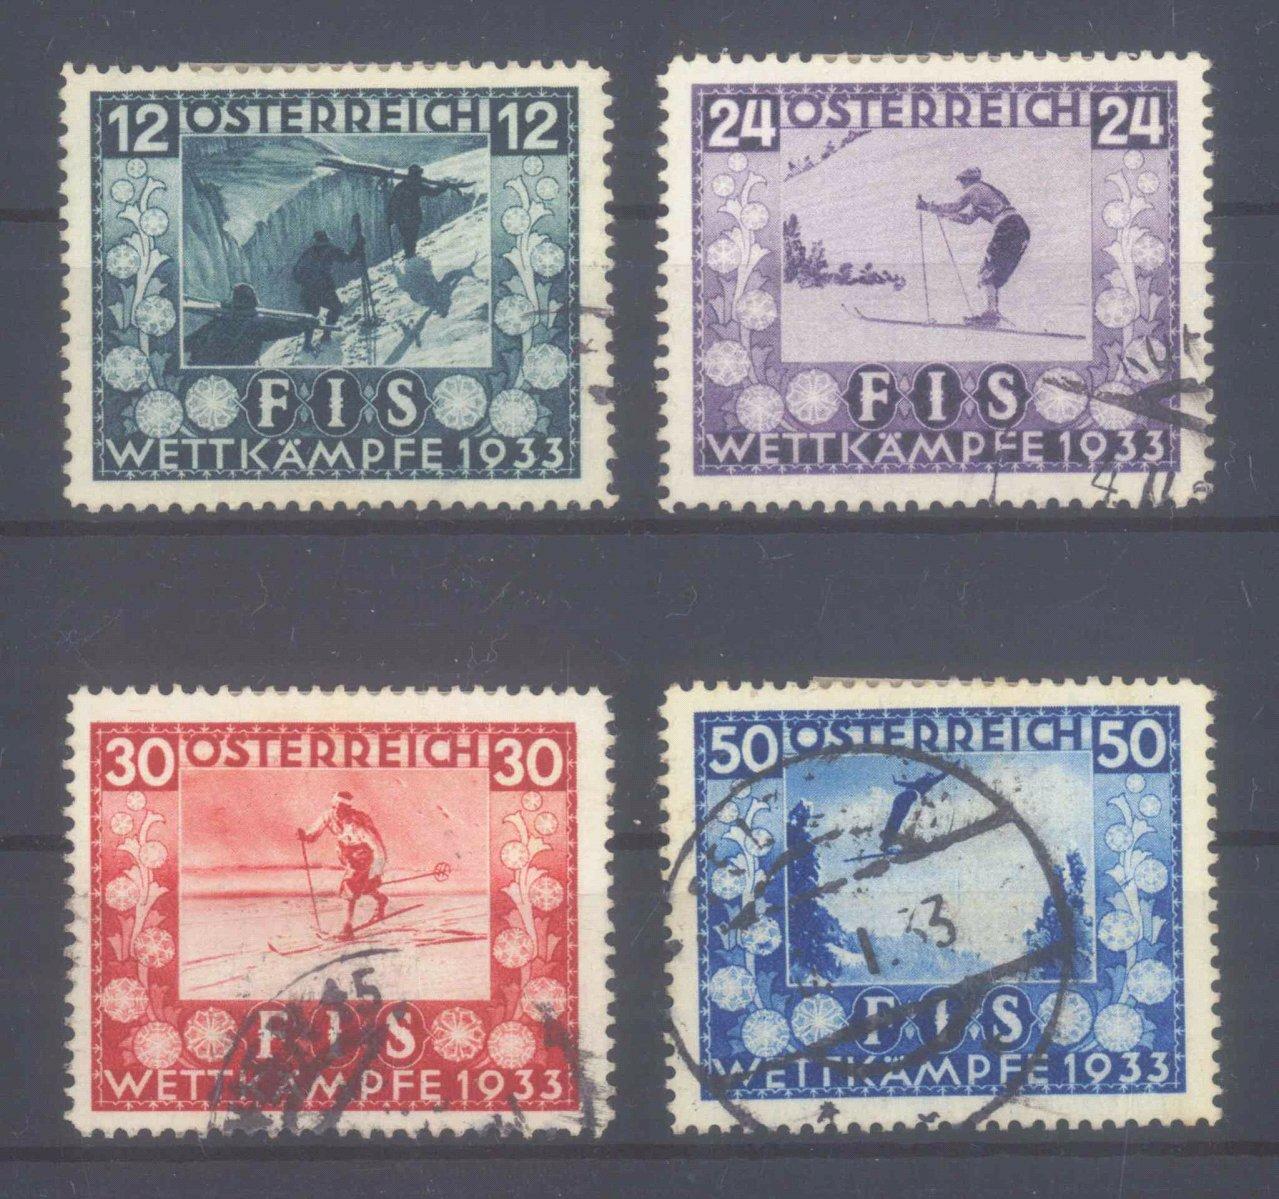 ÖSTERREICH 1933, Jugendwohlfahrt: FIS – INNSBRUCK